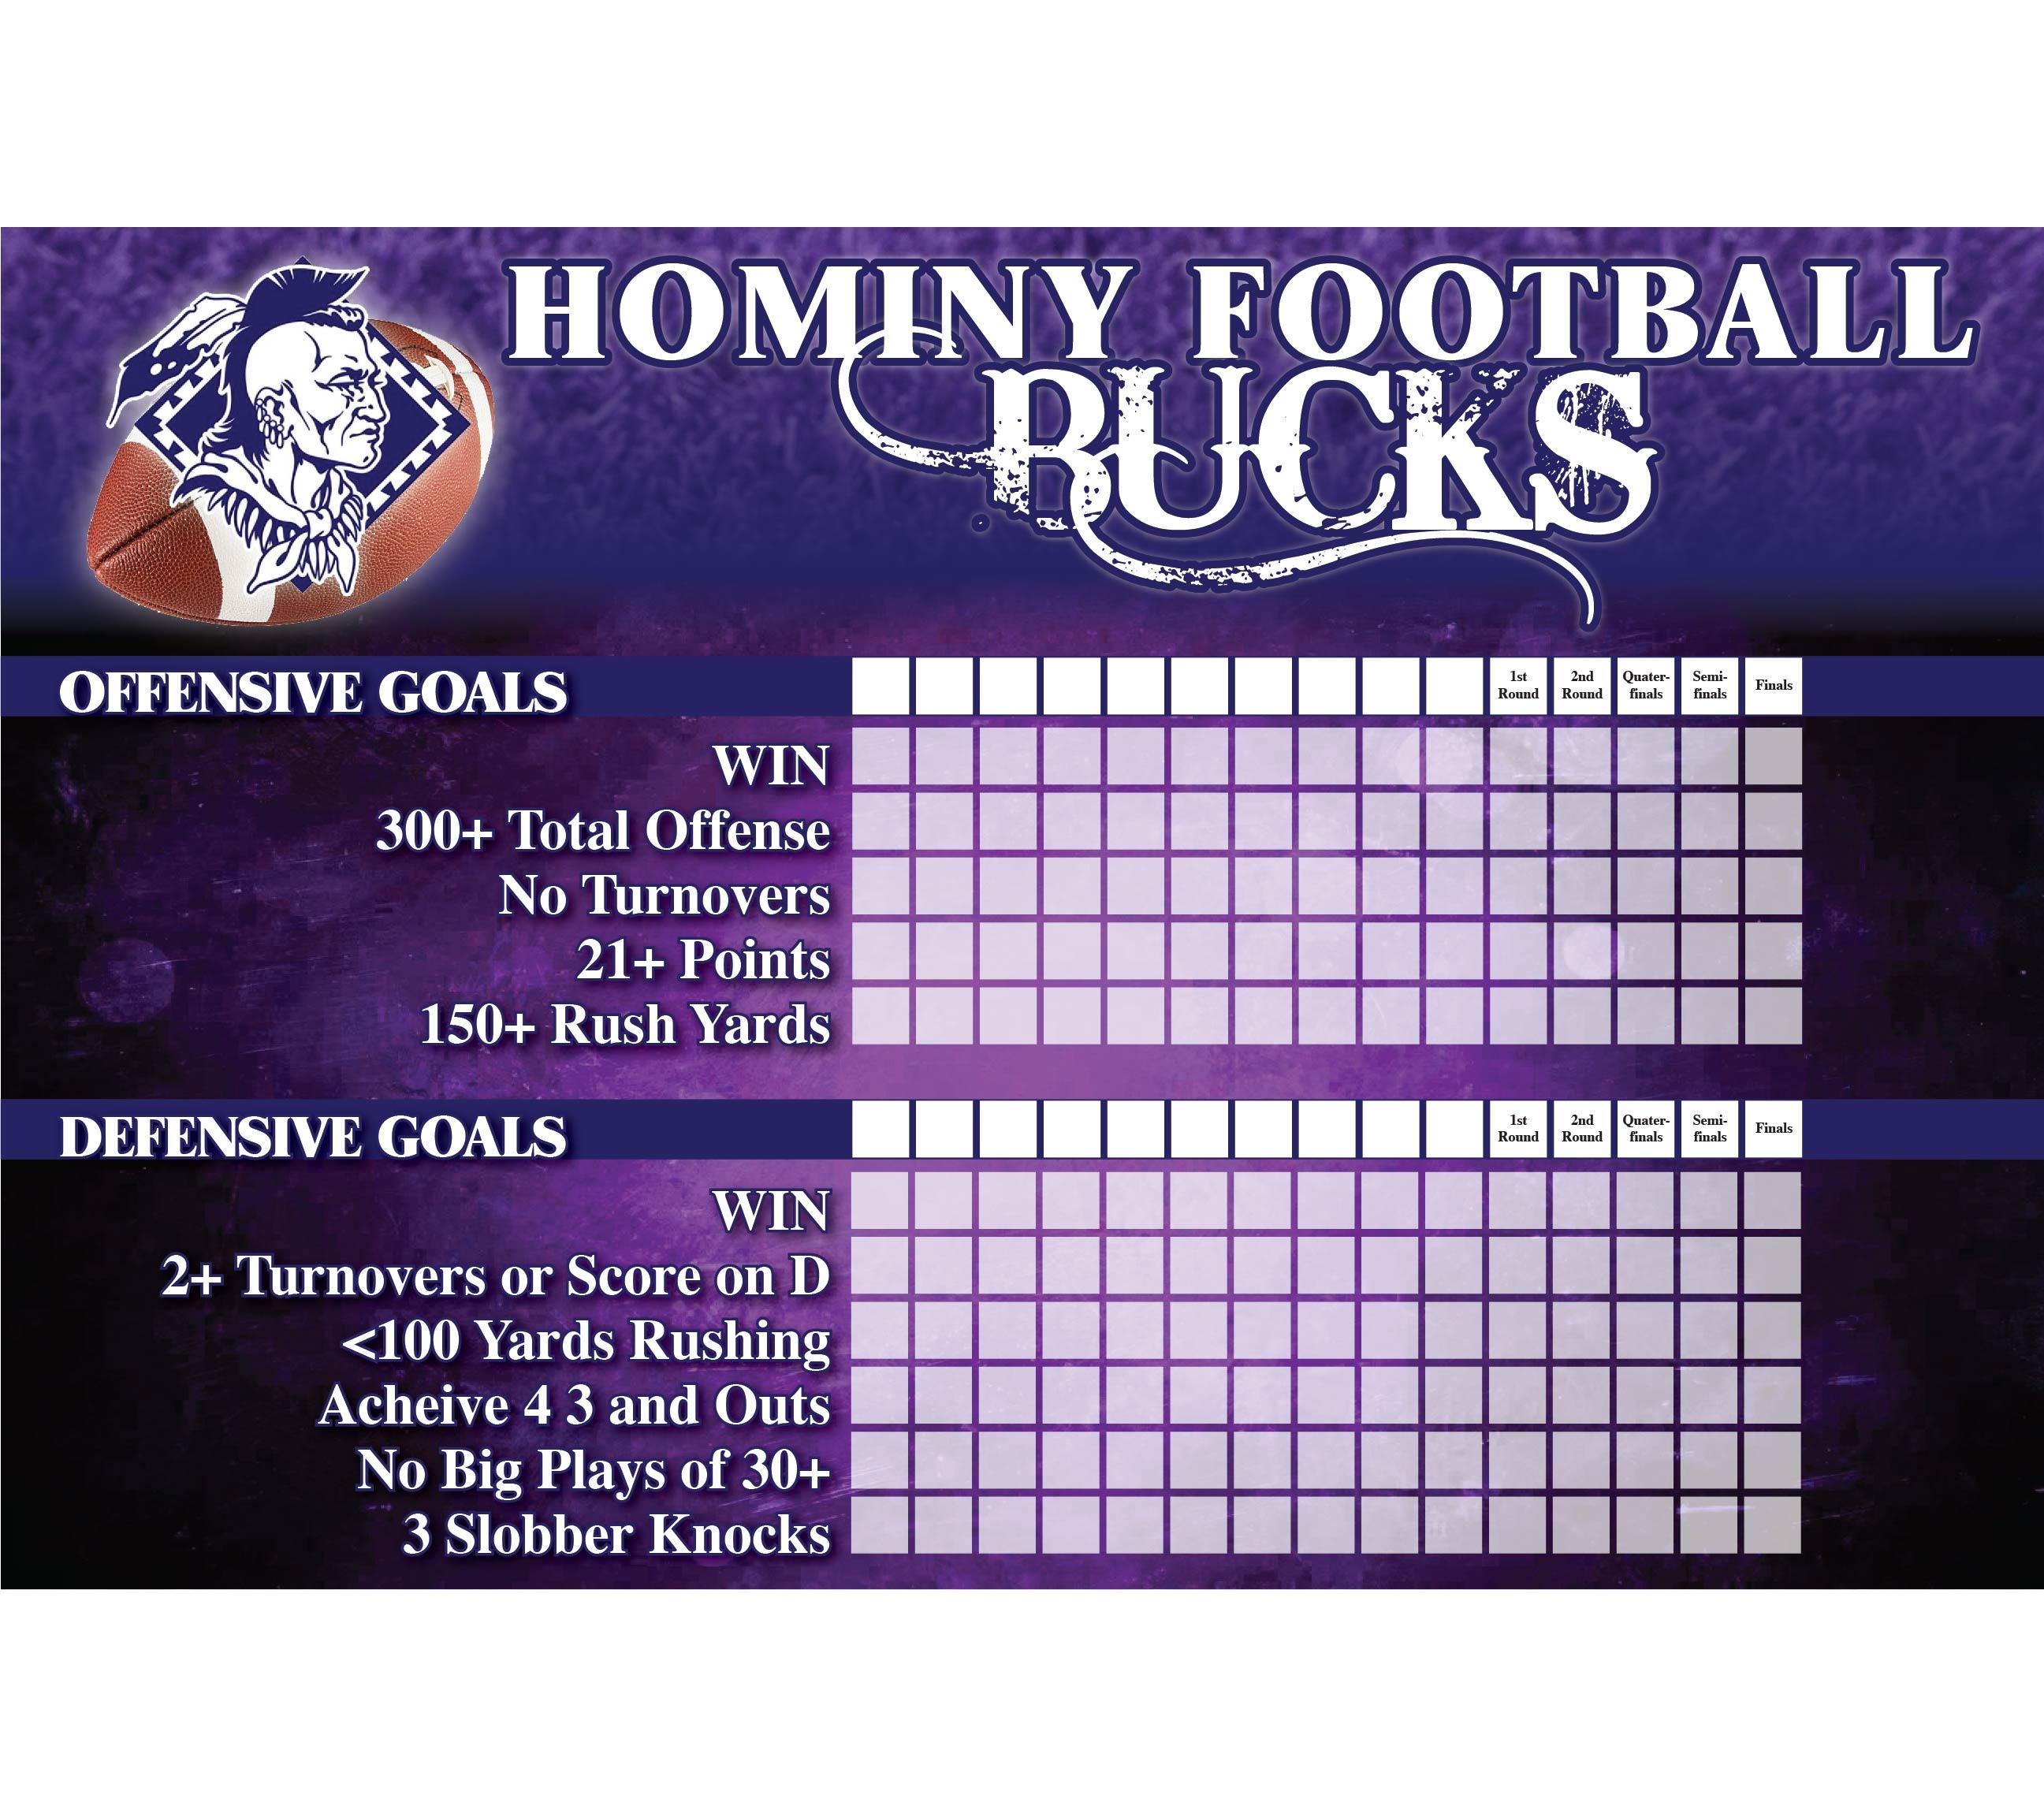 GCI HOMINY FOOTBALL GOALS 2x3